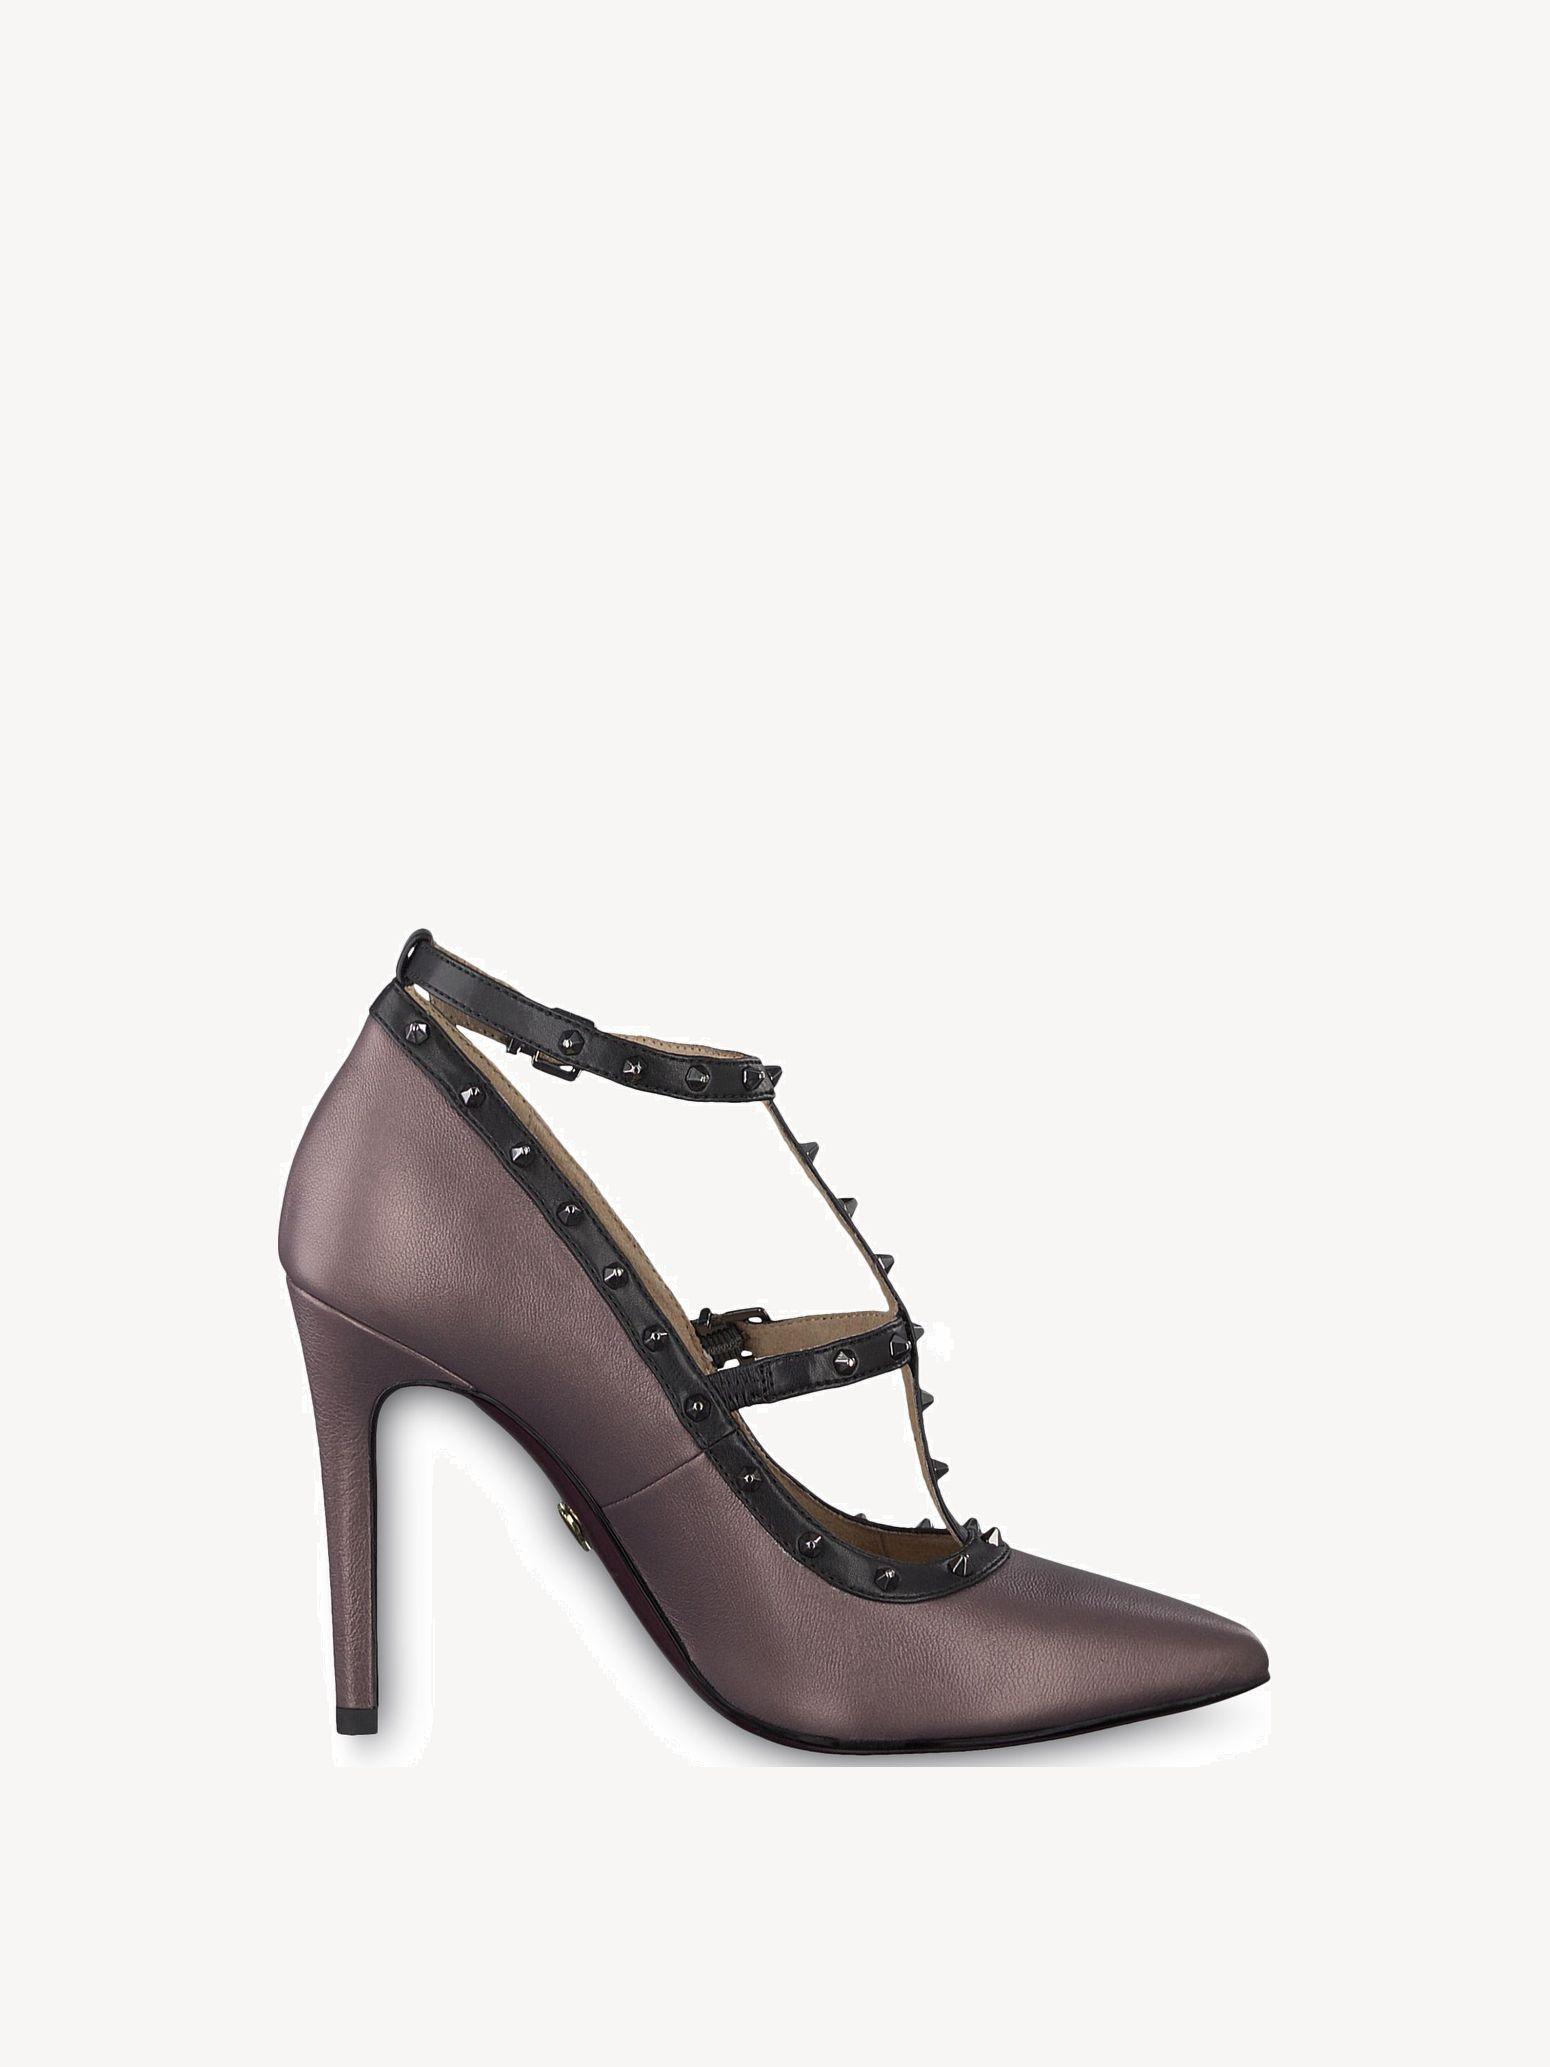 790f7bdc1f6 Leather High Heel